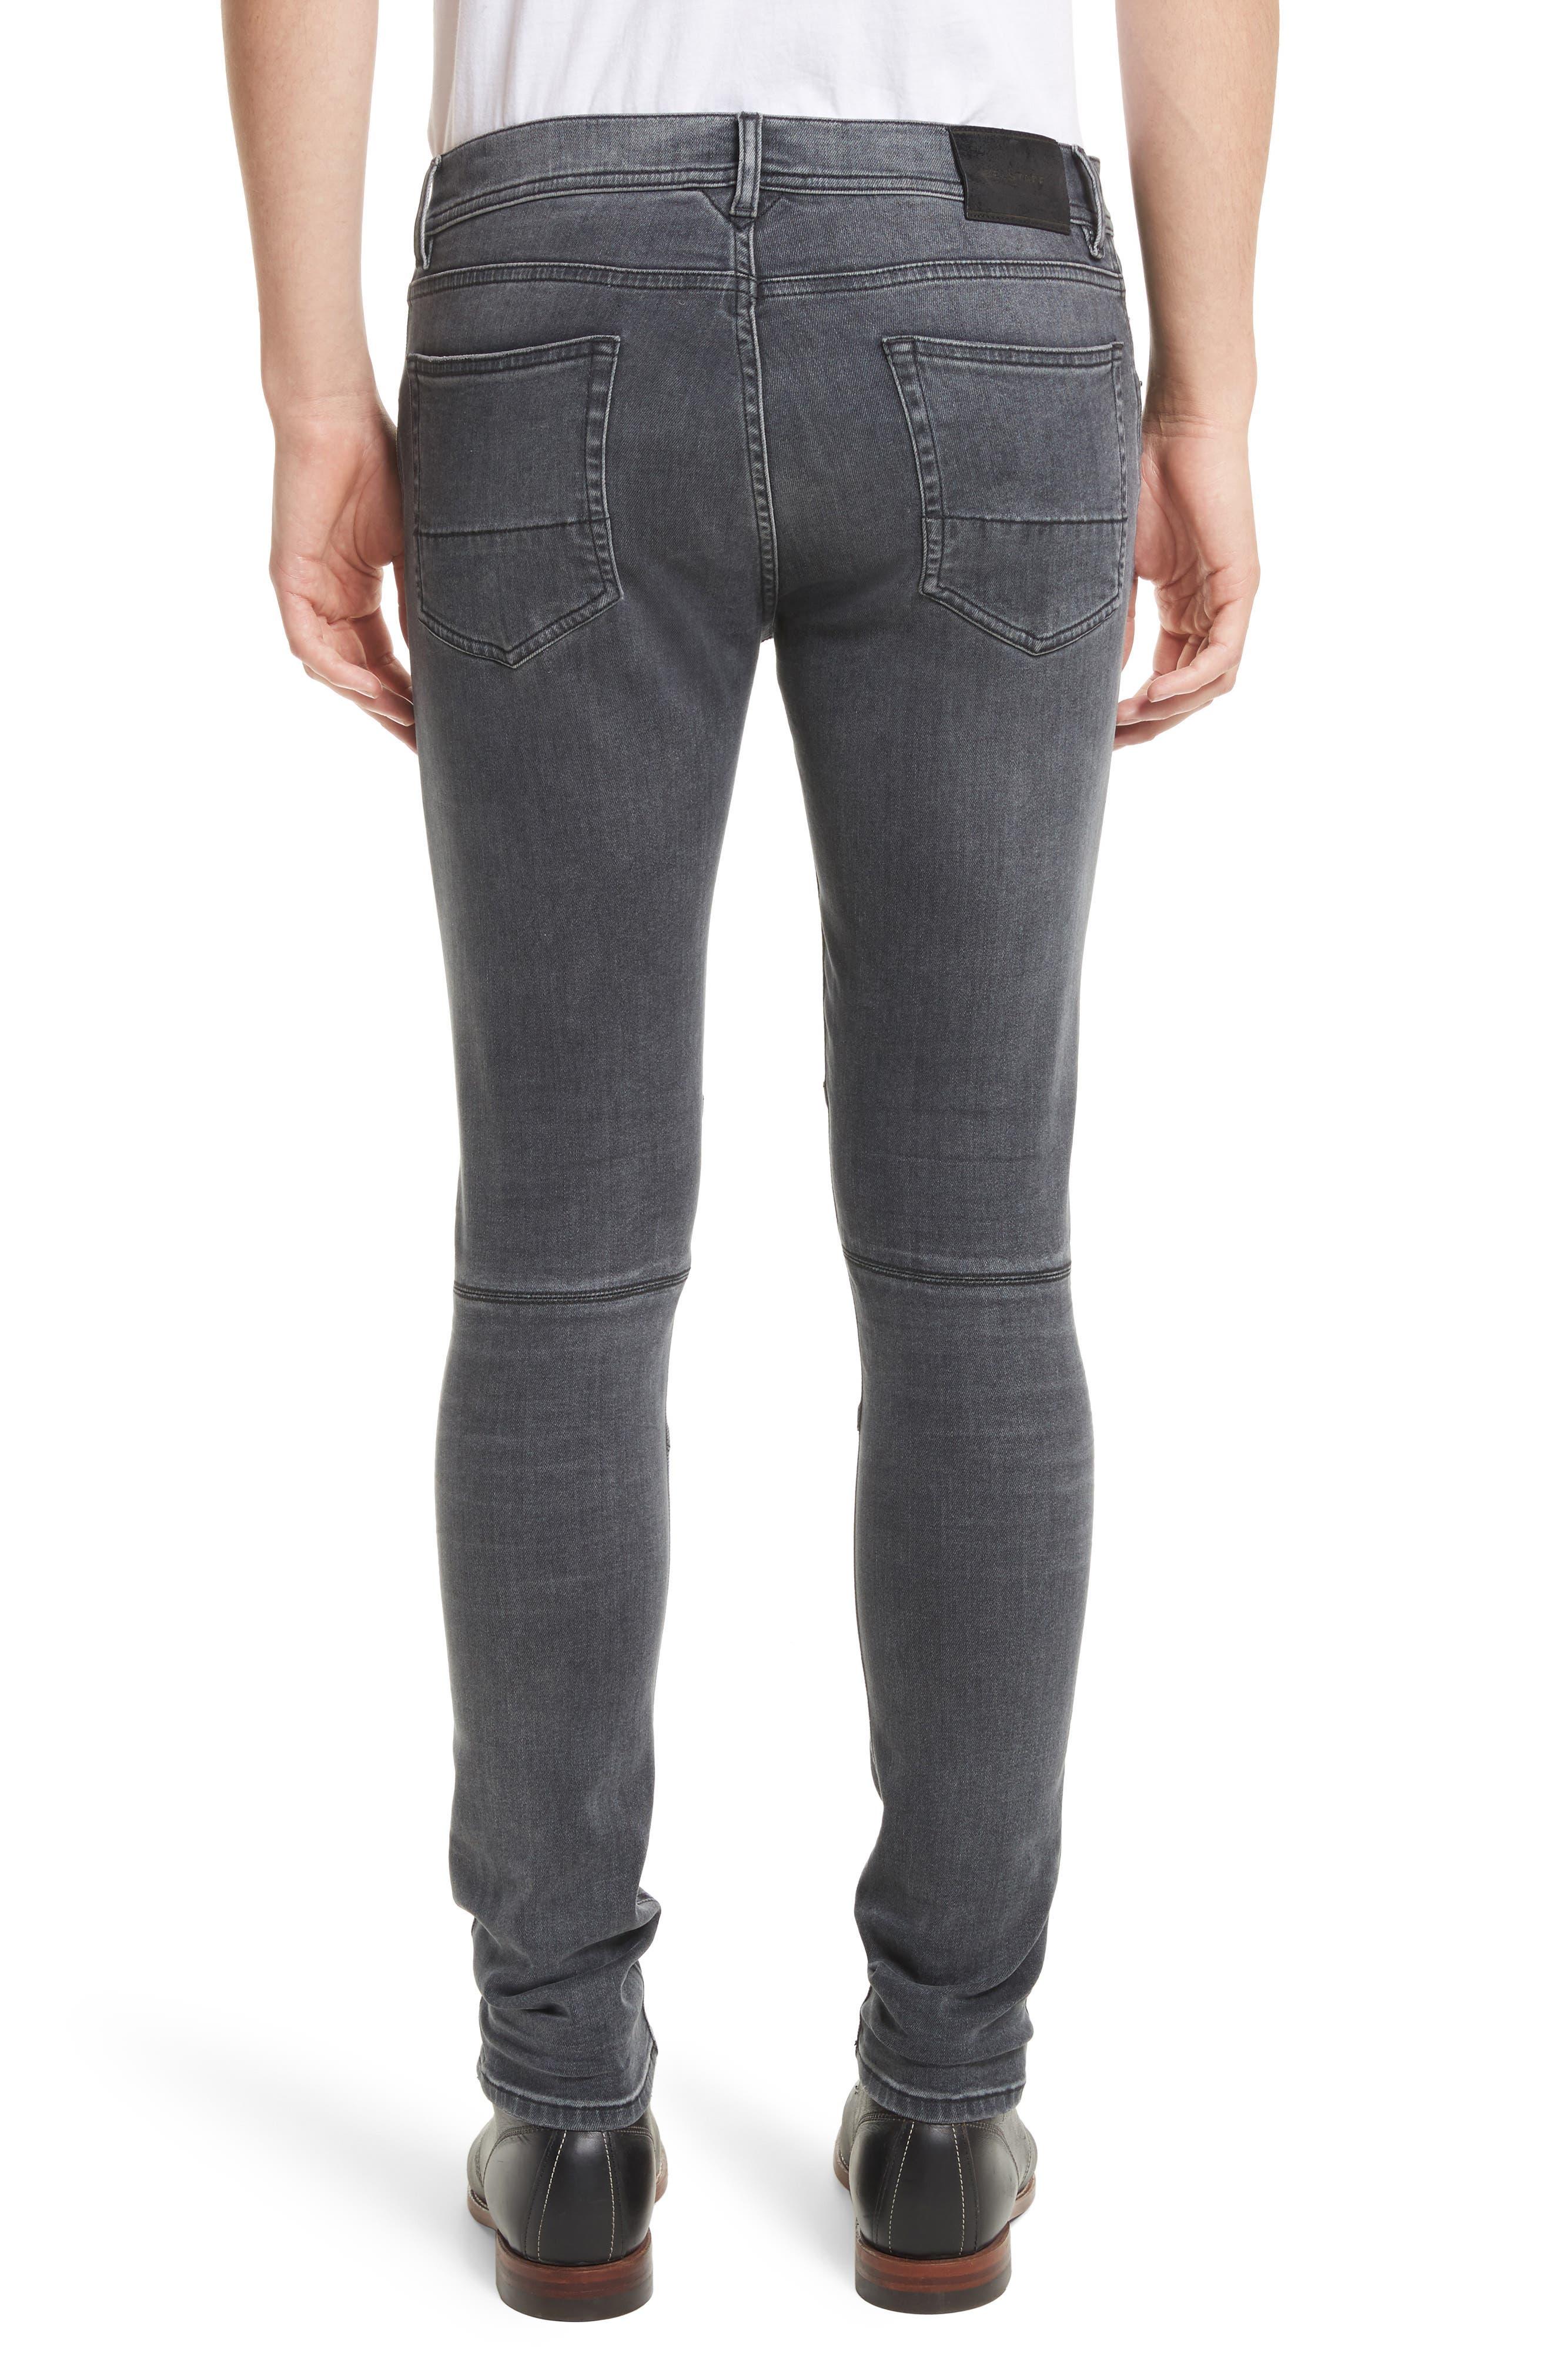 Tattenhall Washed Denim Skinny Jeans,                             Alternate thumbnail 2, color,                             022